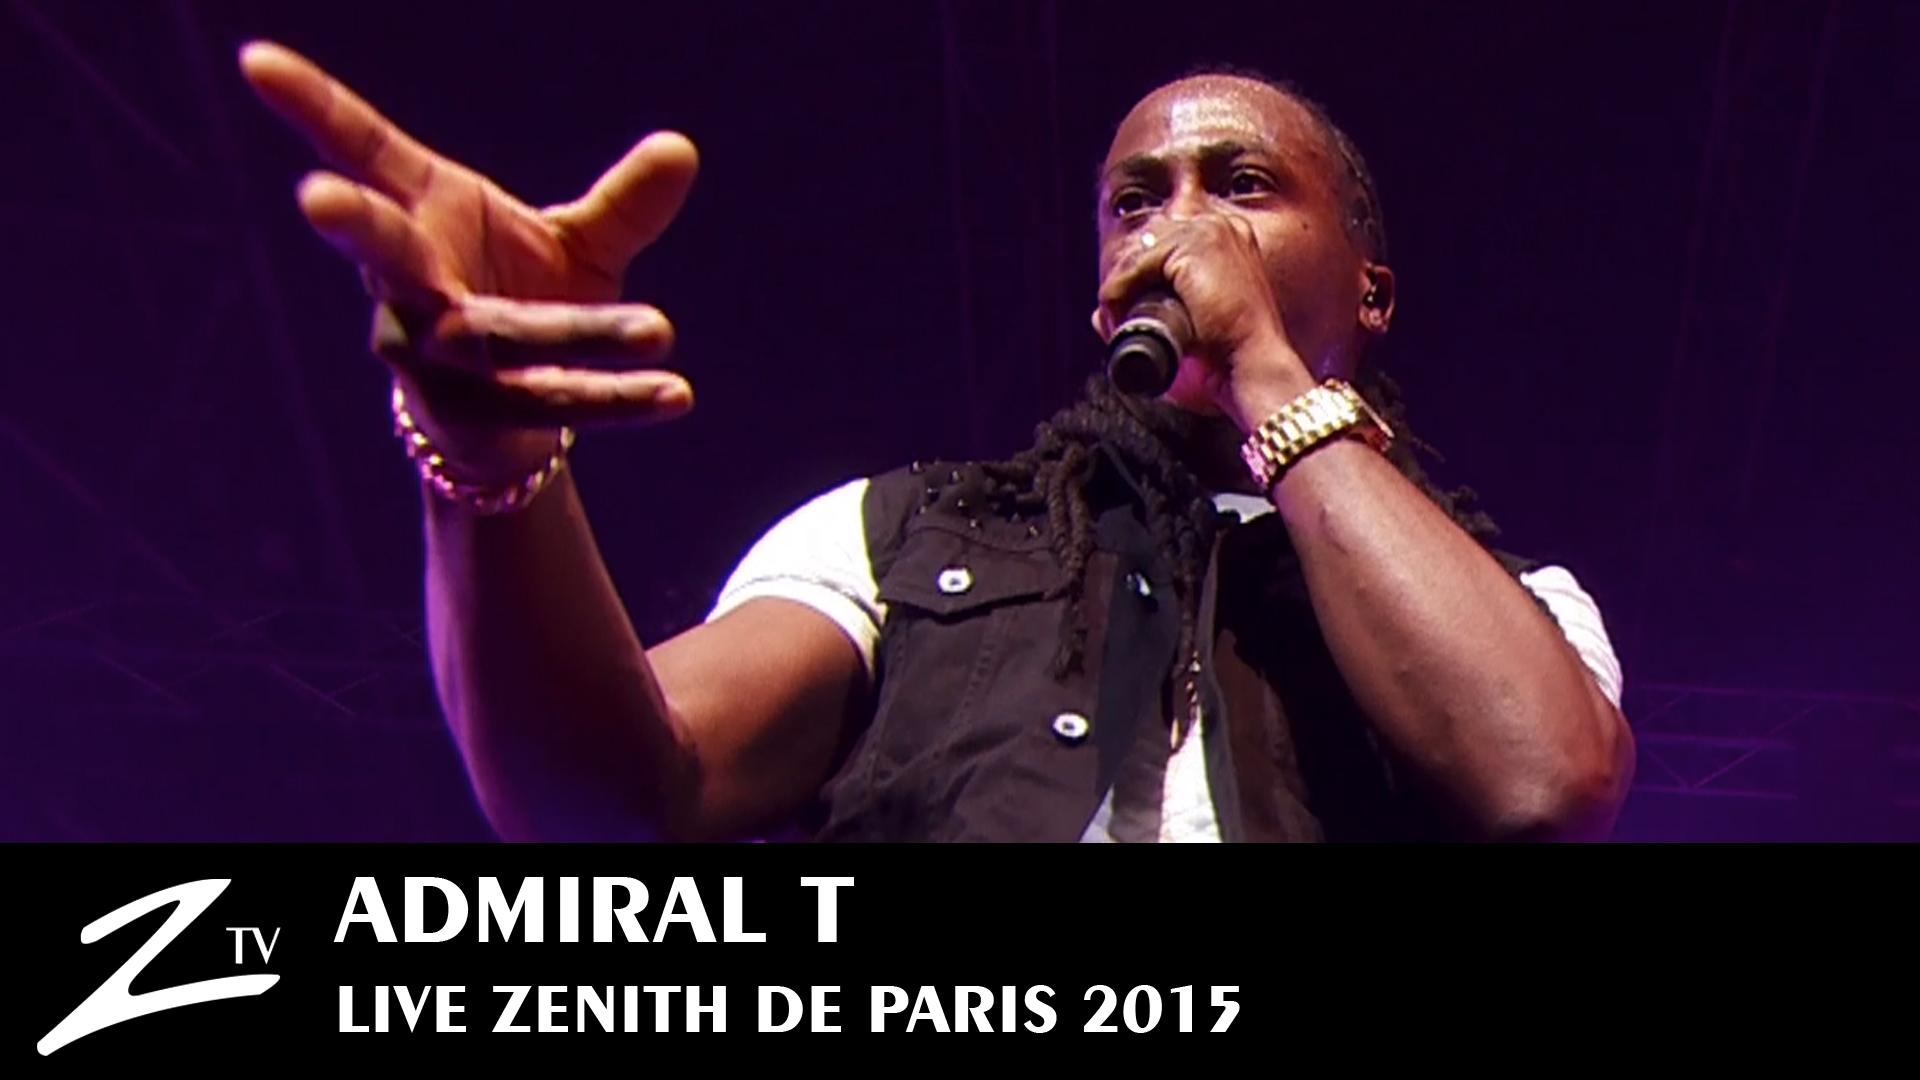 Admiral T Zénith de Paris 2015